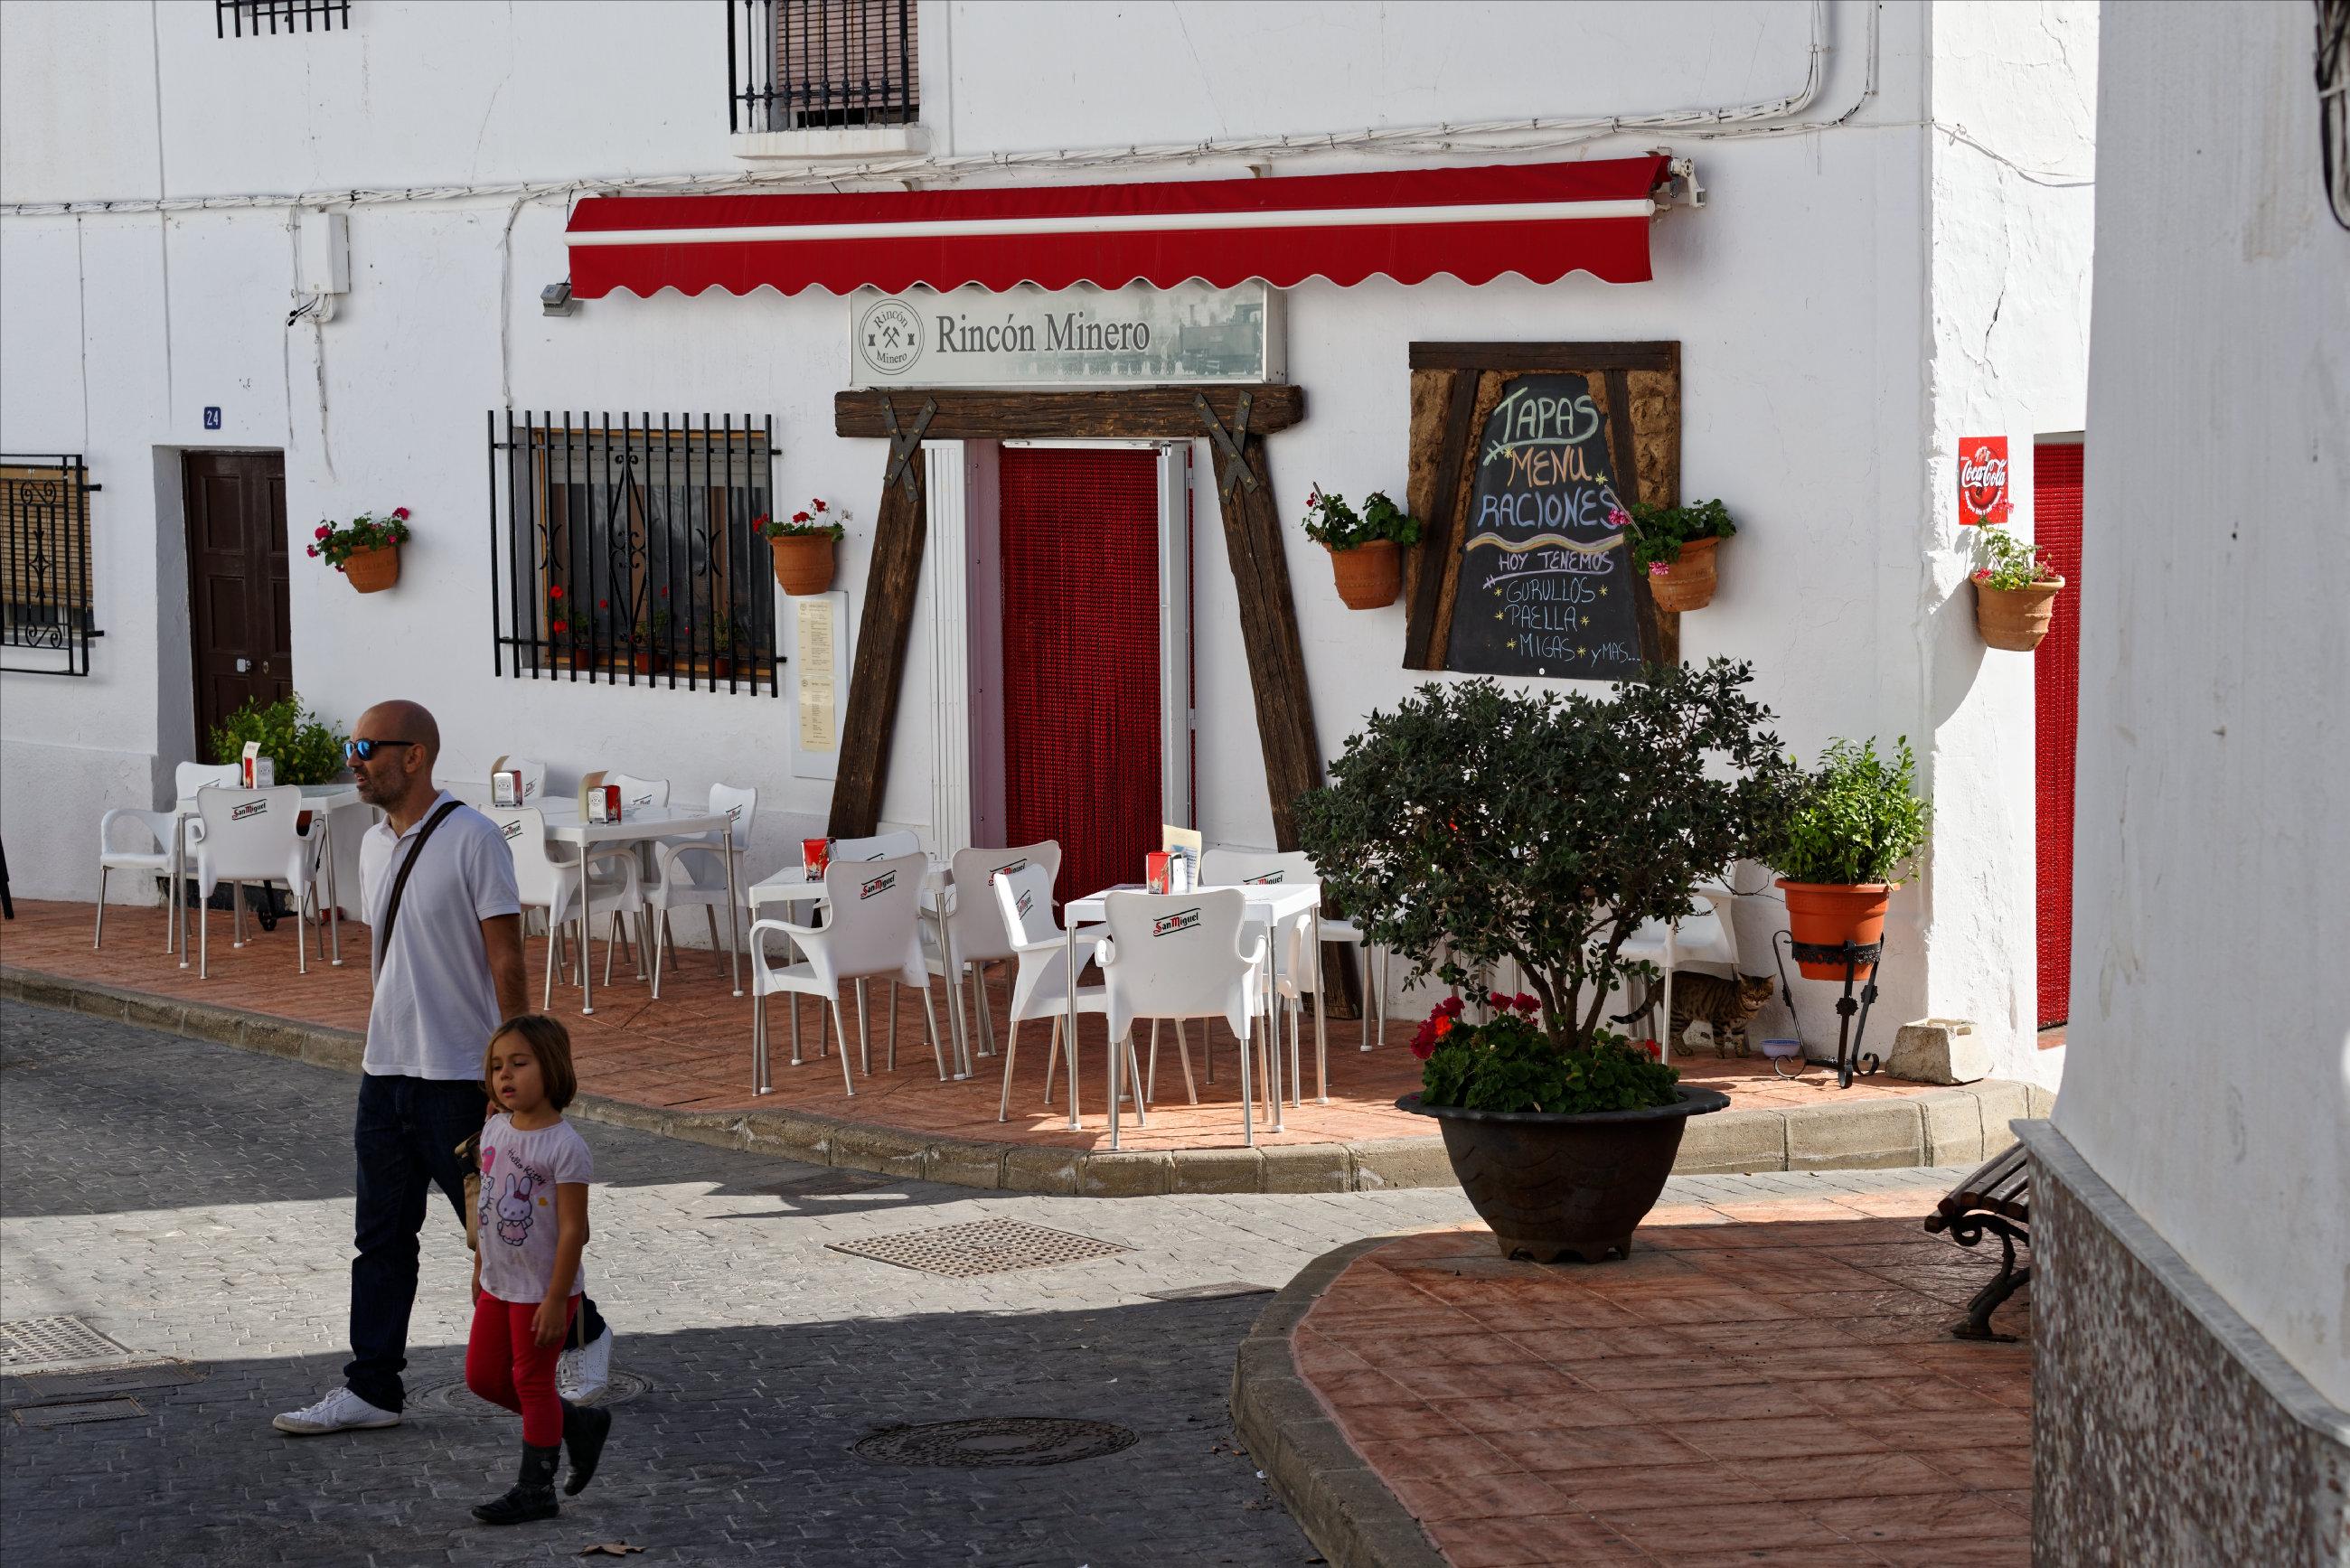 151107-Lucainena de las Torres  (127)